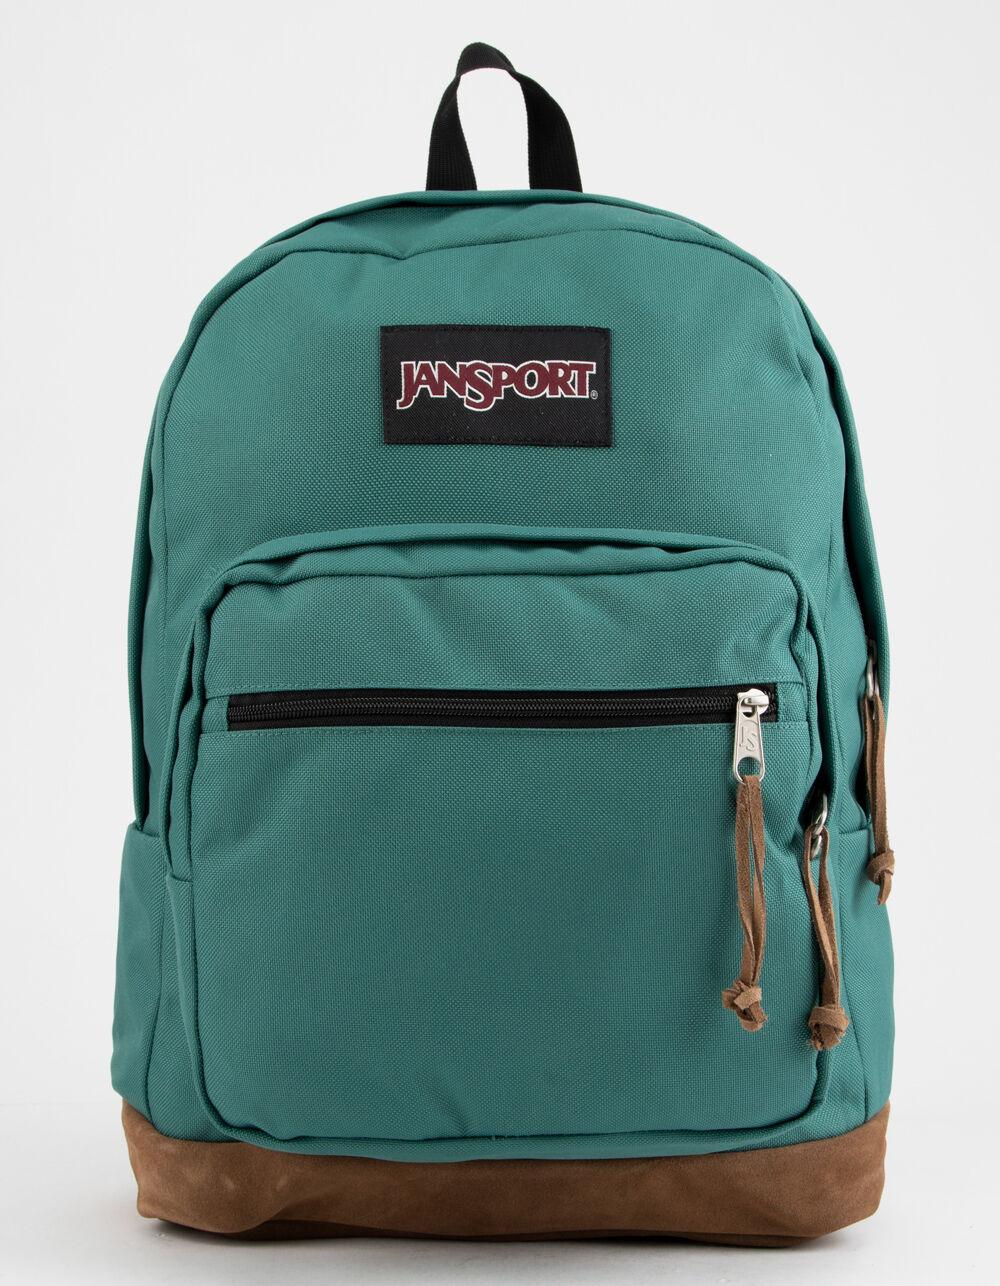 JANSPORT Right Pack Blue Spruce Backpack